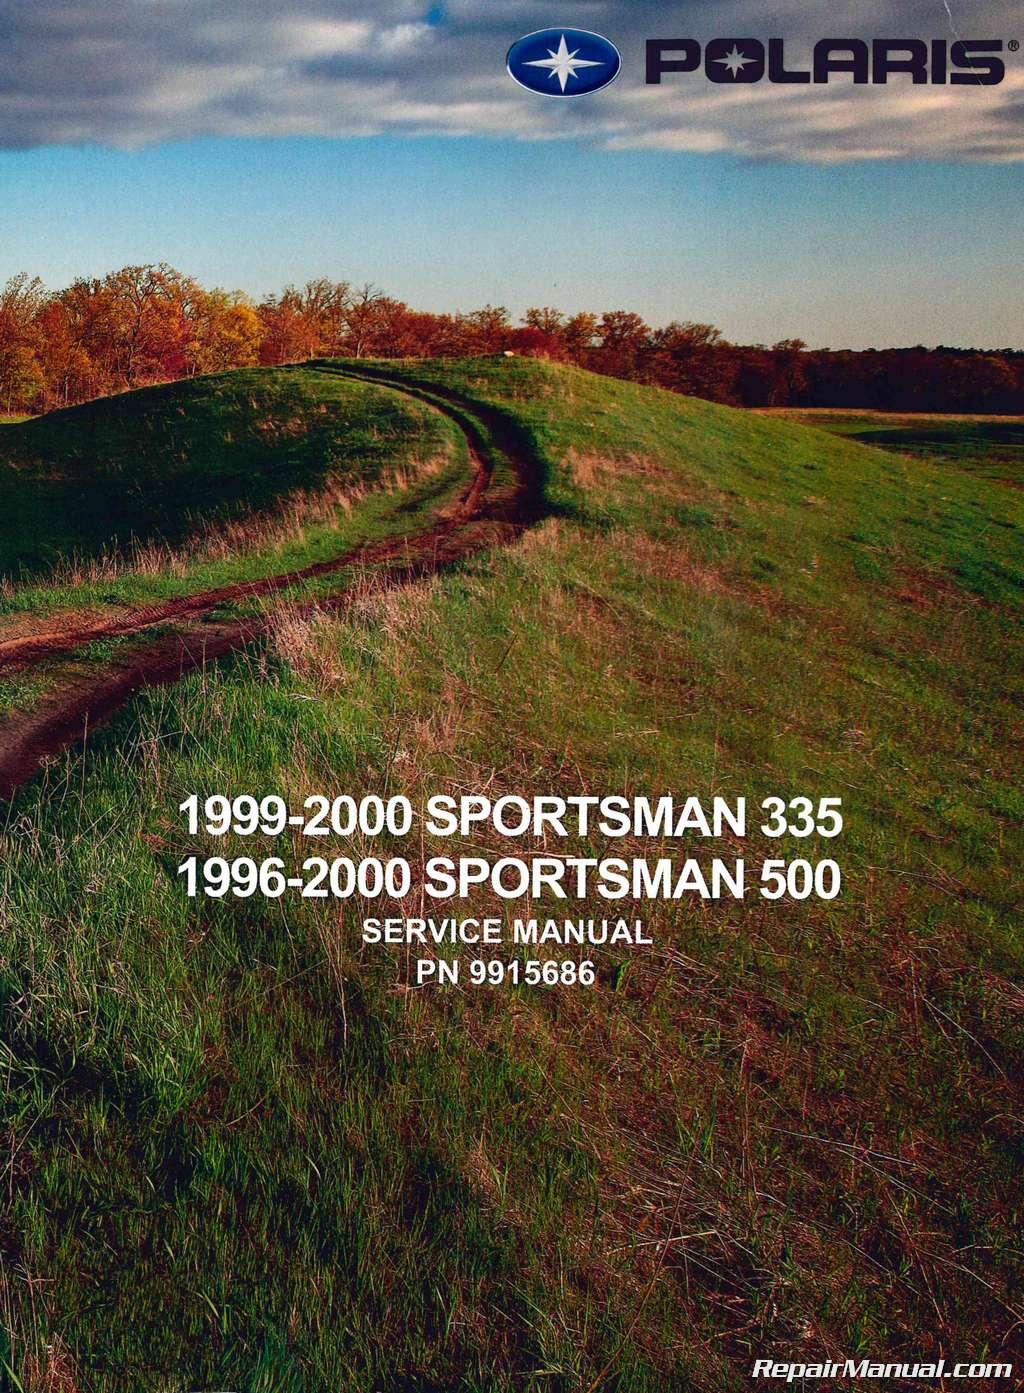 service manual for 2007 polaris sportsman 500